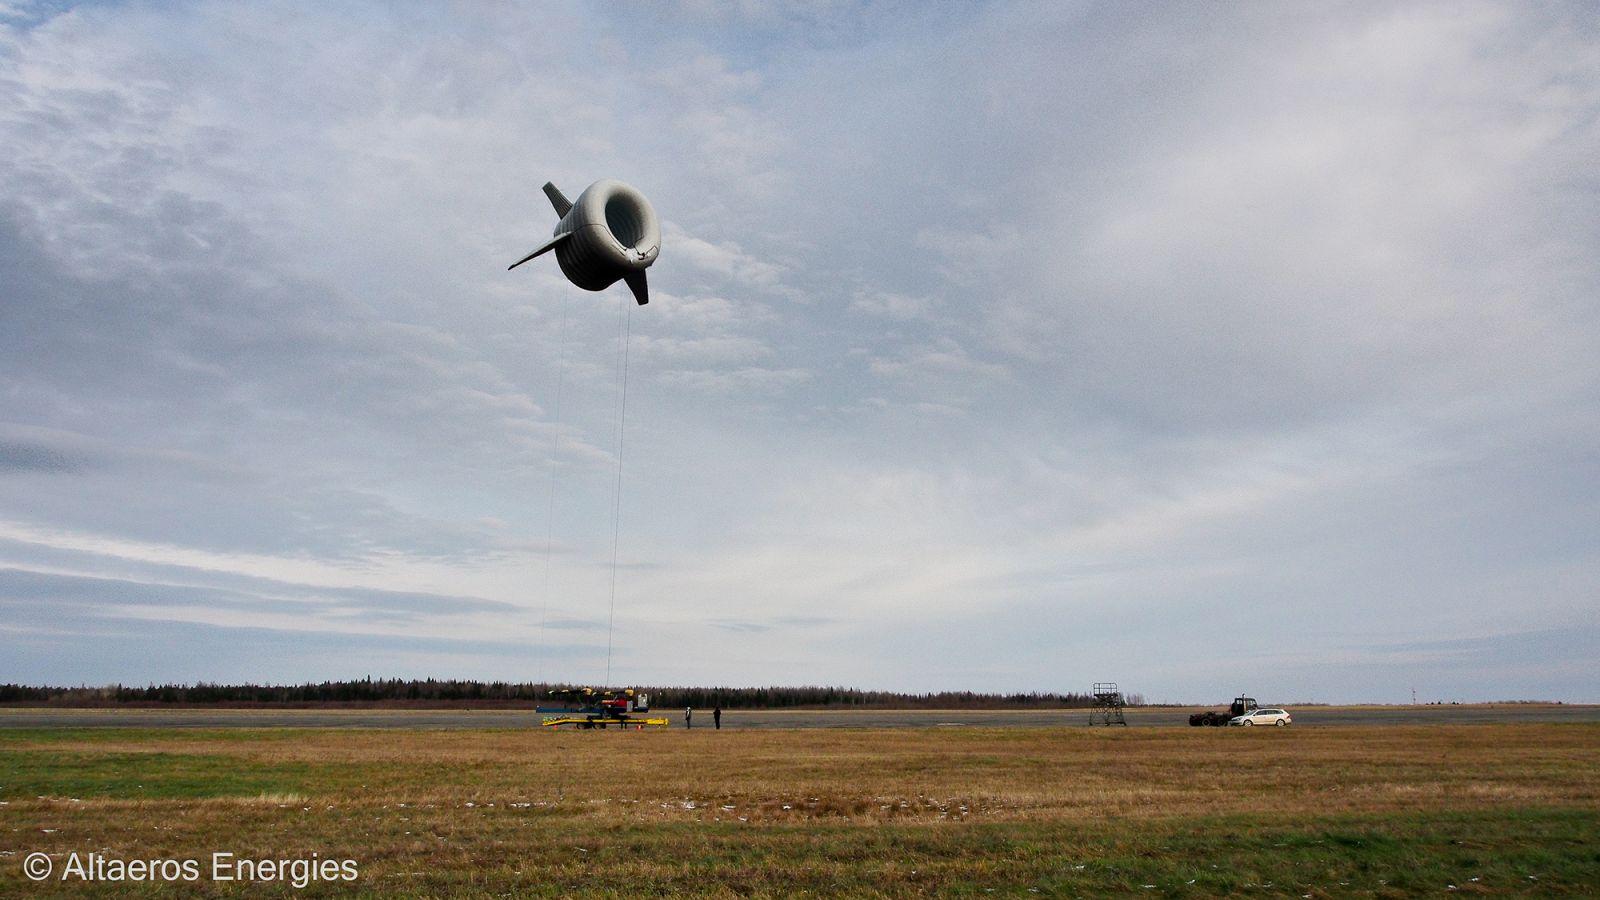 Airborne Wind Turbine